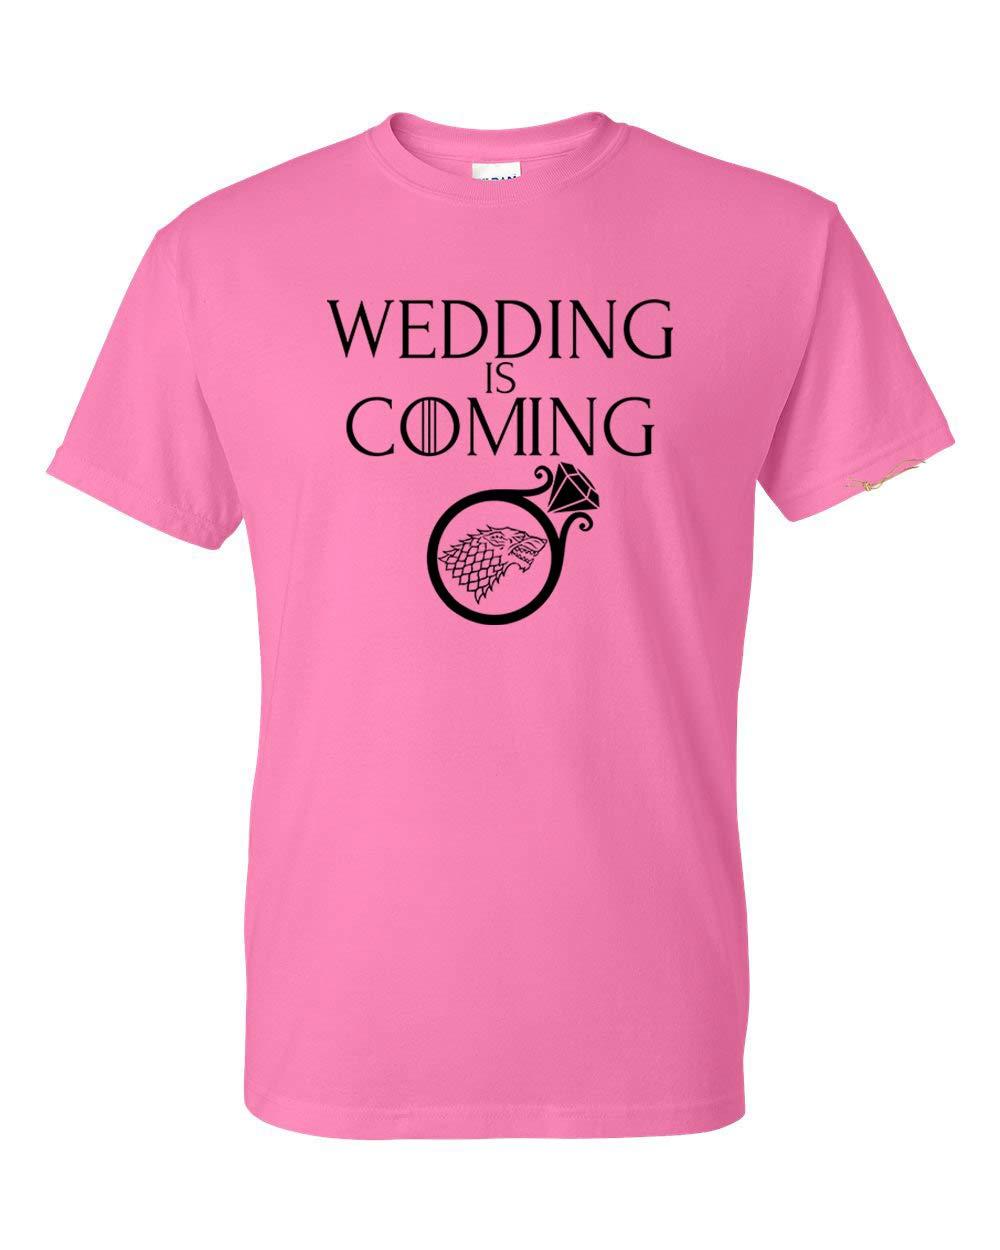 Game Of Thrones Wedding Is Coming Bride Unisex Short Sleeve Shirt